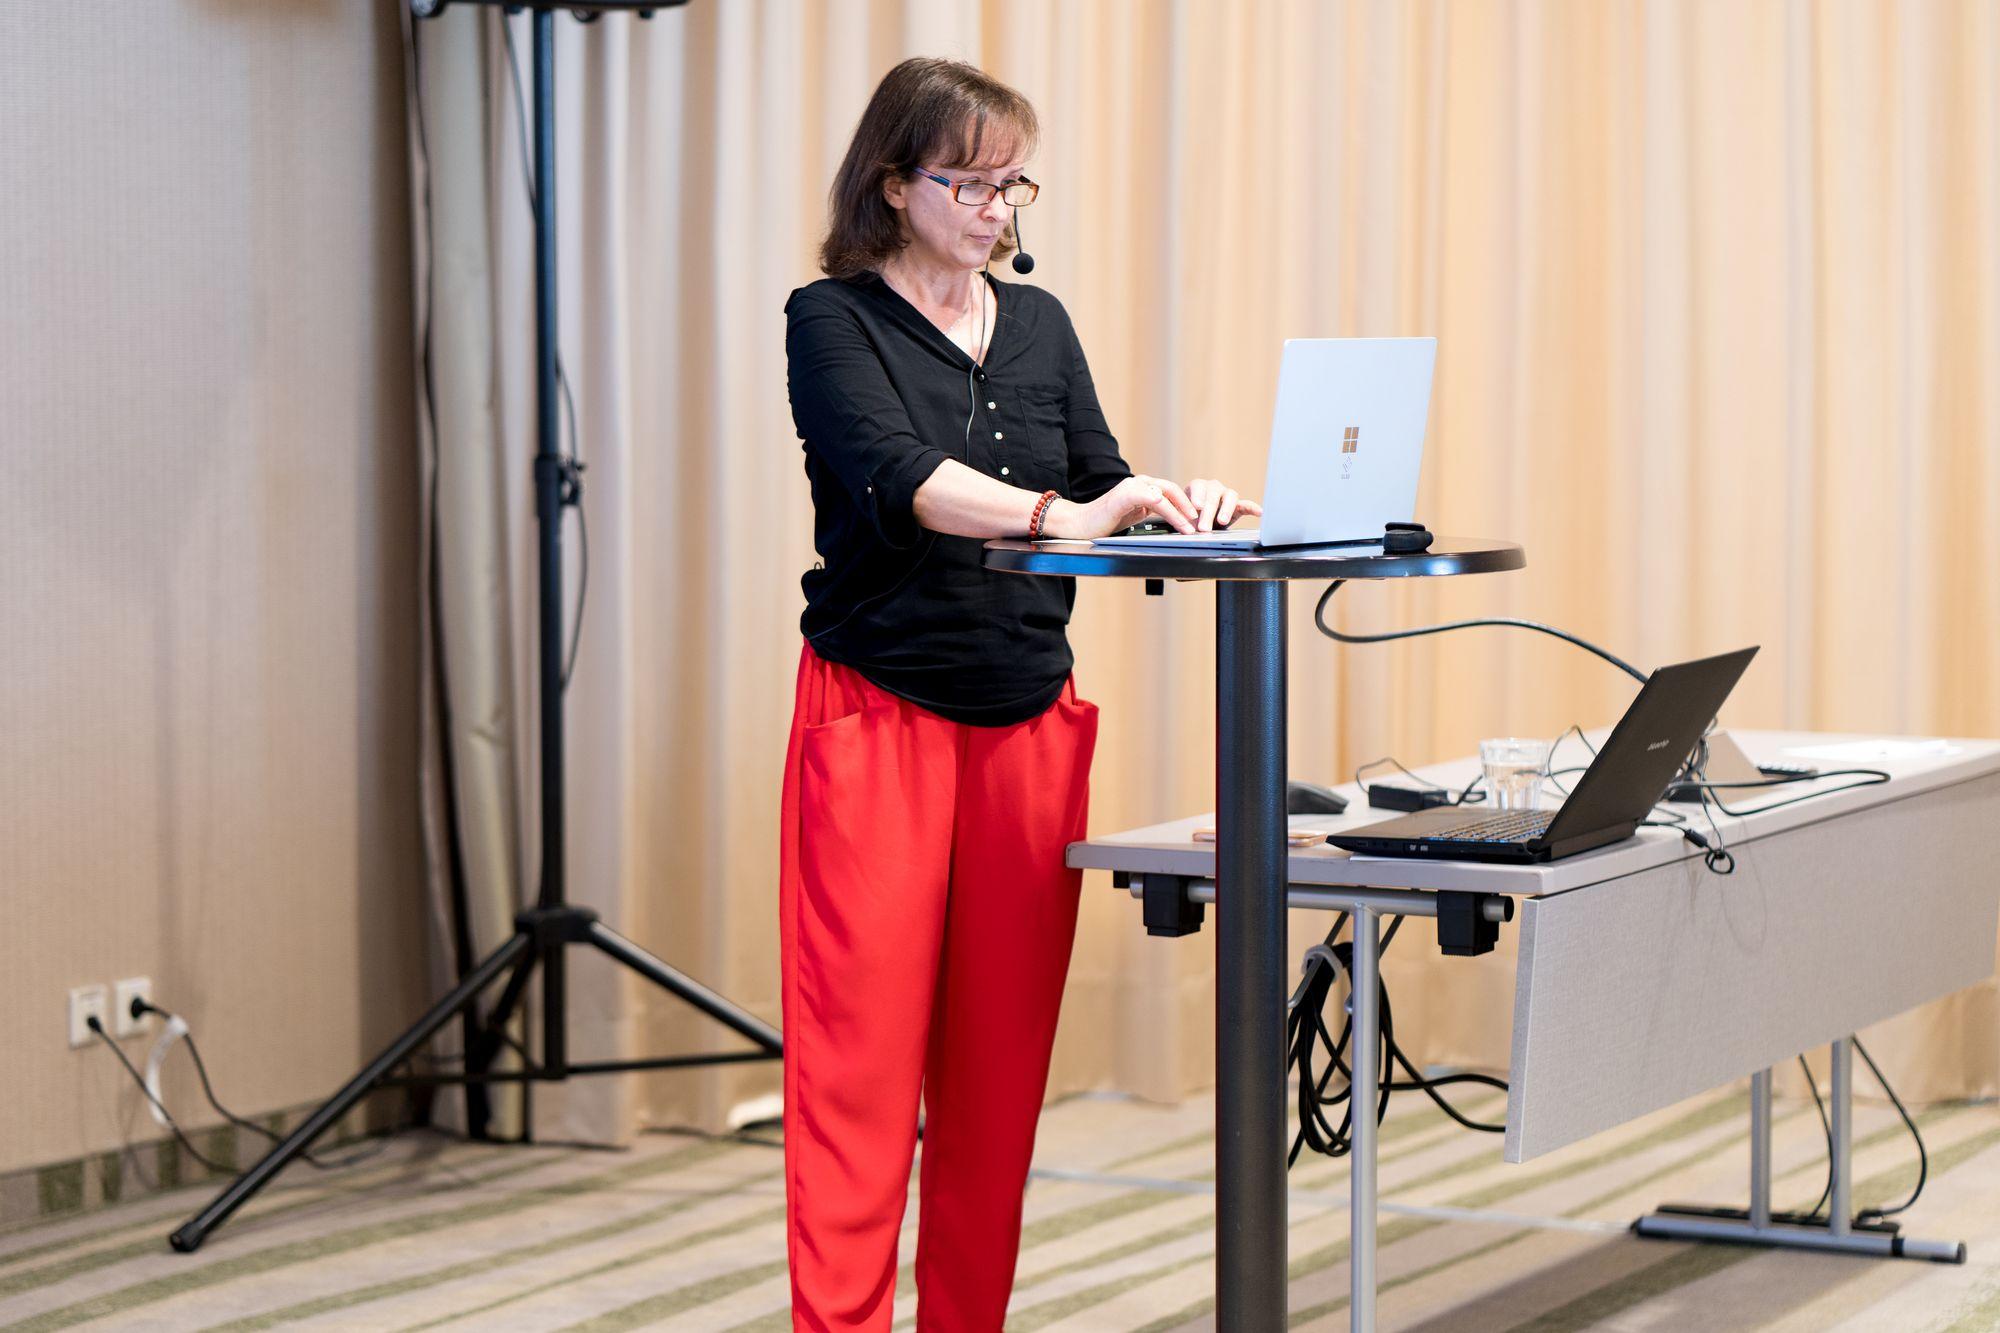 Monika Pavona als Sprecher auf dem Builderall Everest 2019 in Nürnberg (Germany)